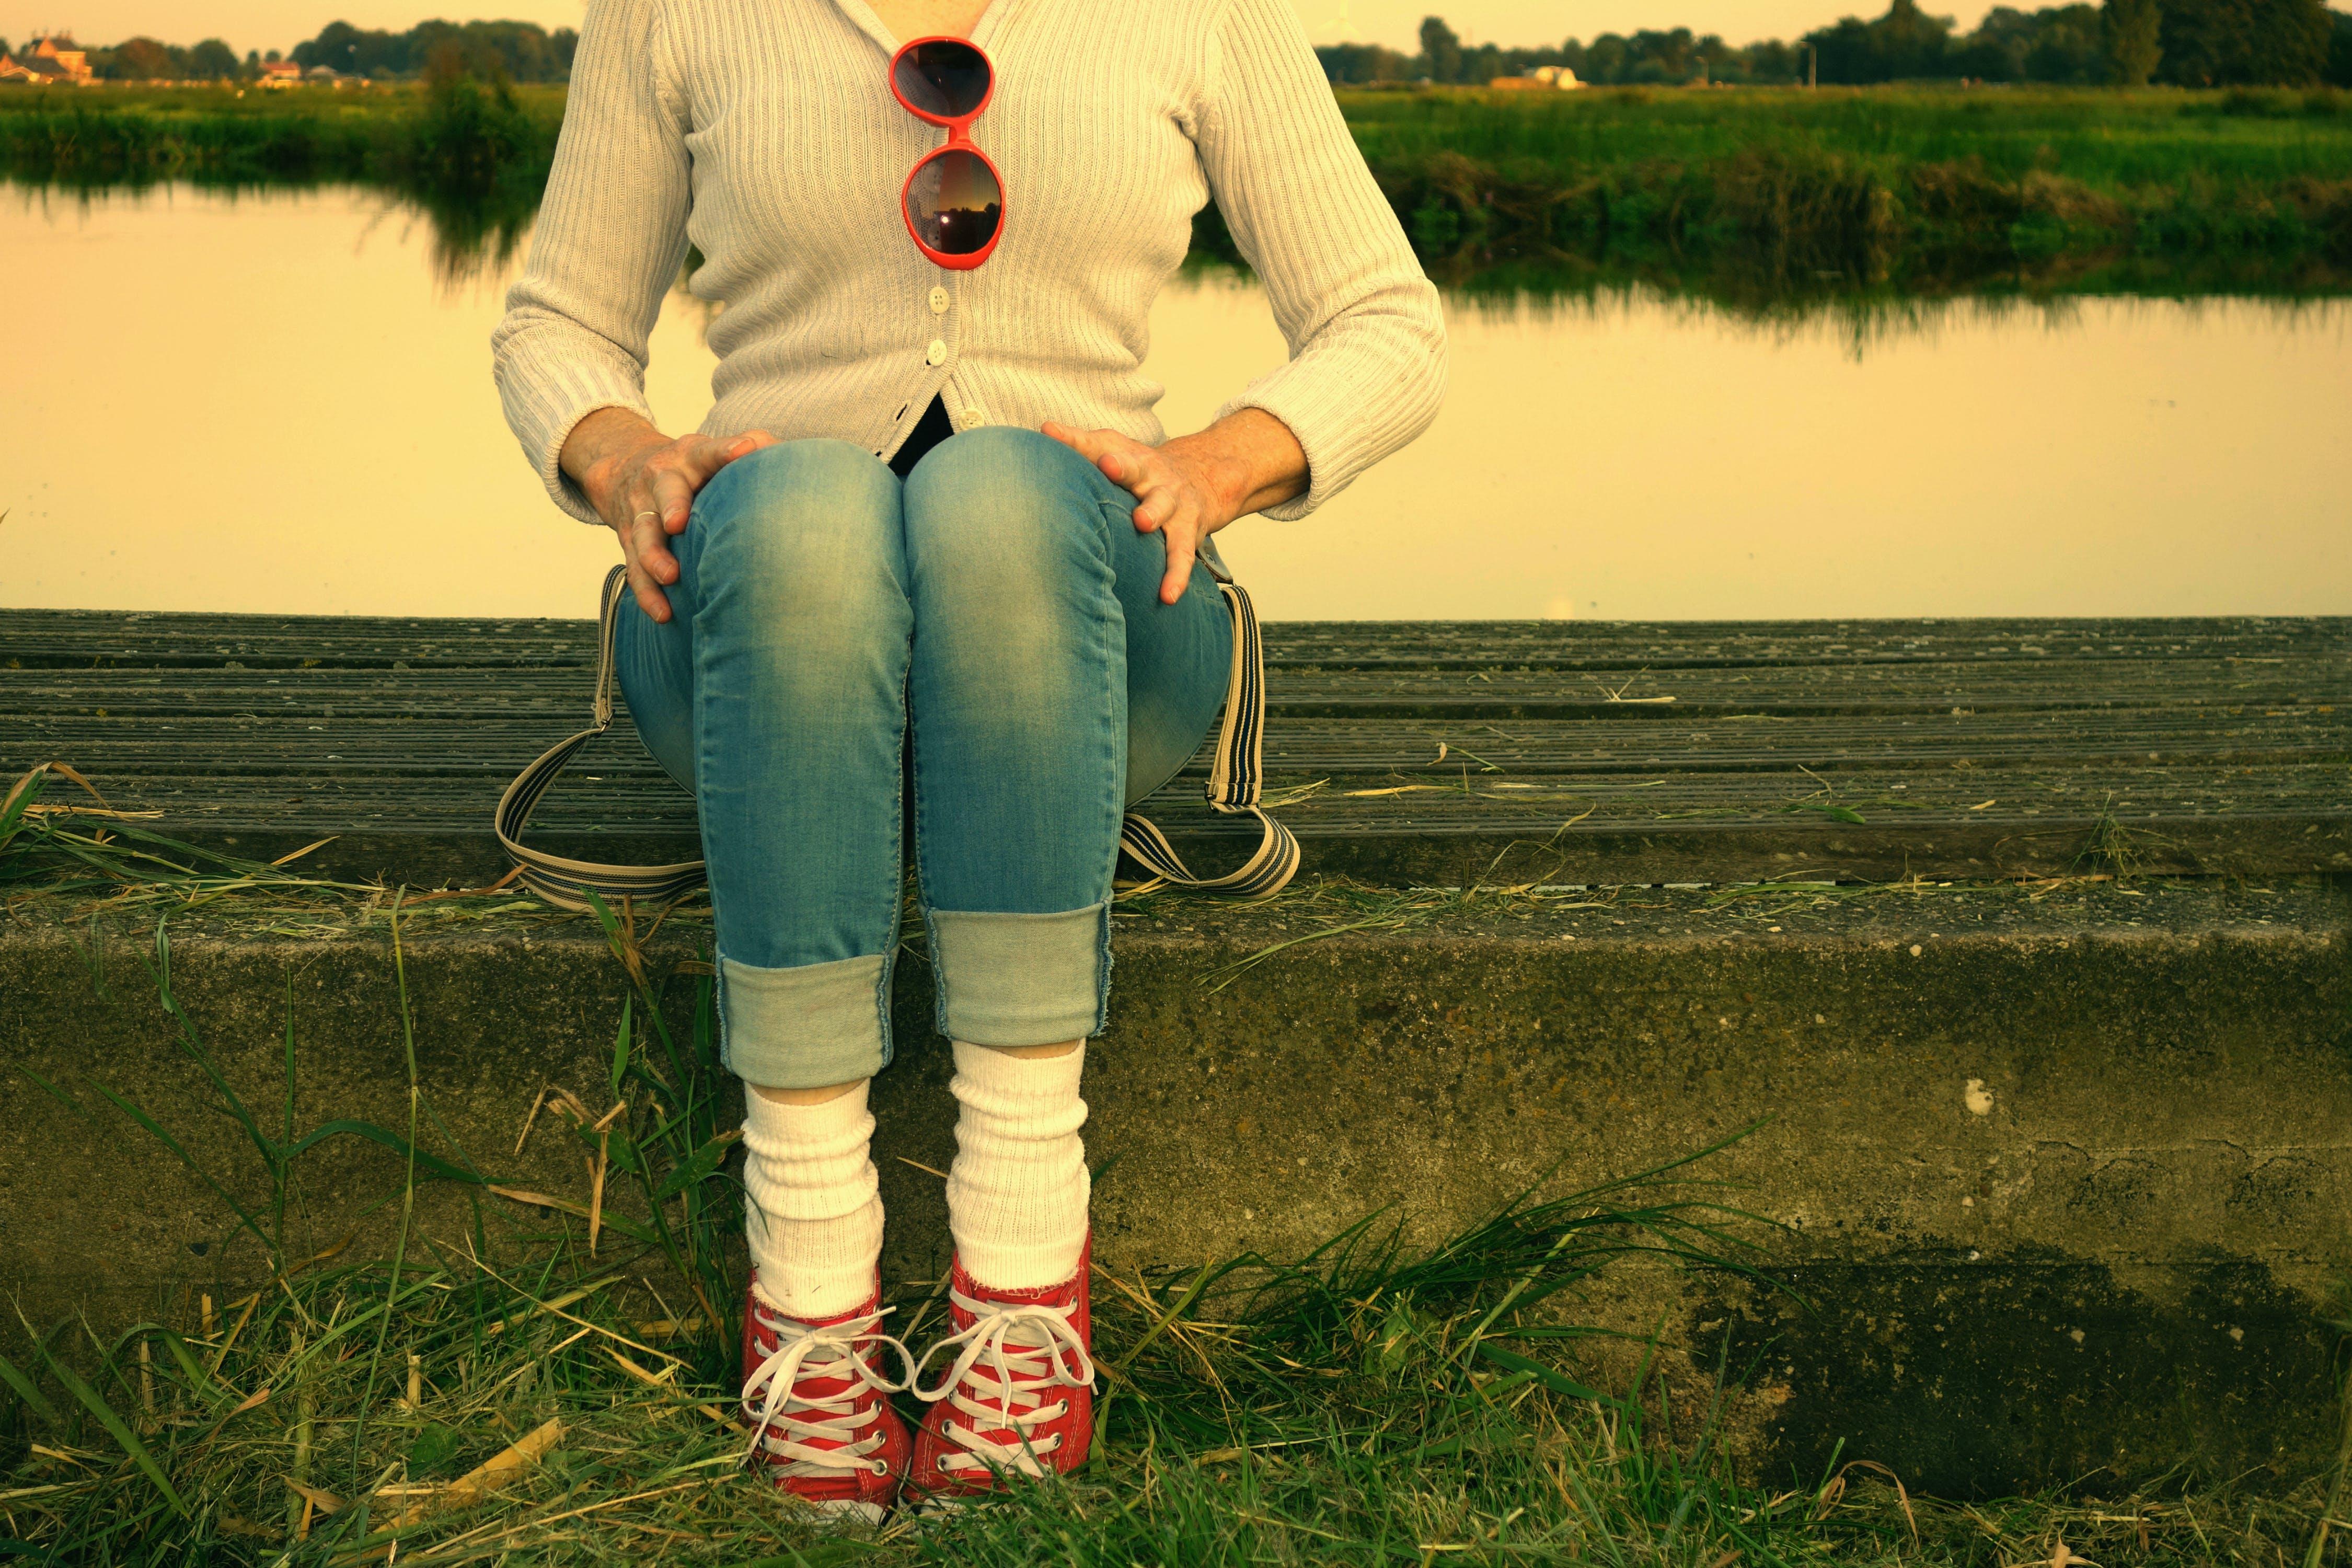 cardigan, jeans, natural setting